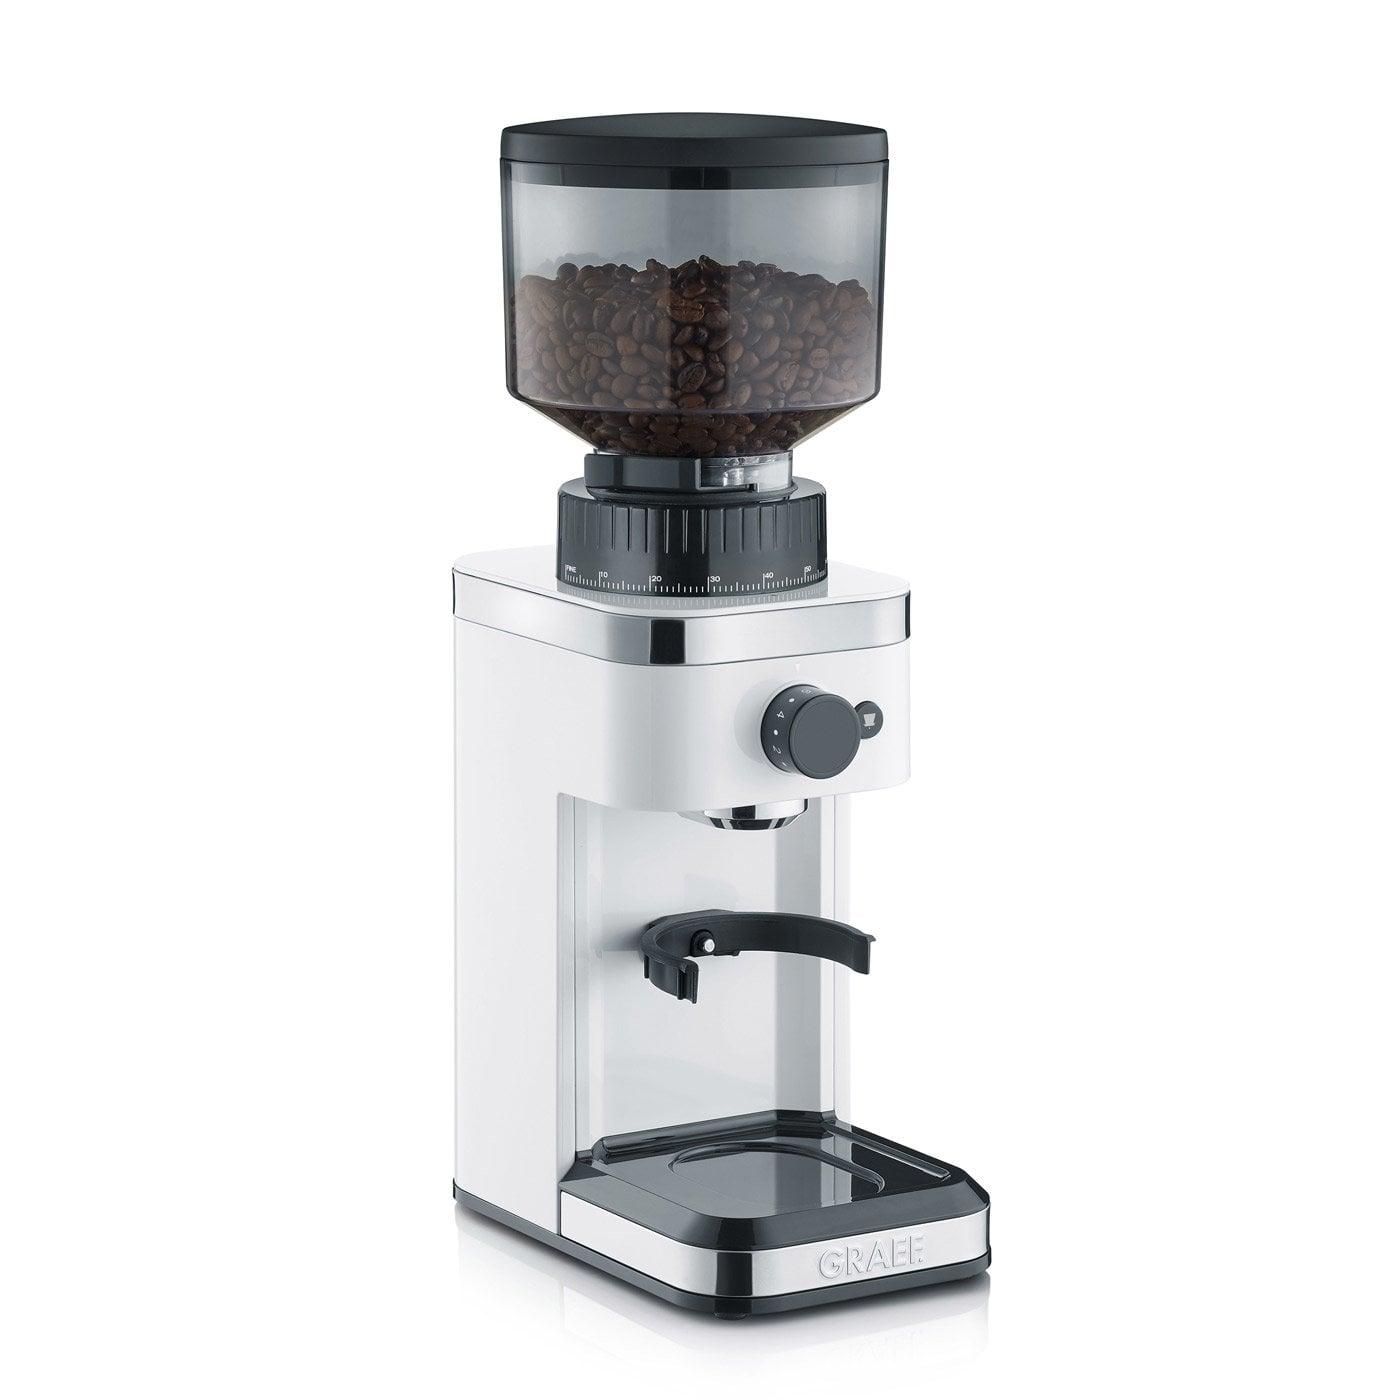 Онлайн каталог PROMENU: Кофемолка электрическая GRAEF COFFEE GRINDER CM501, белый Graef CM501EU